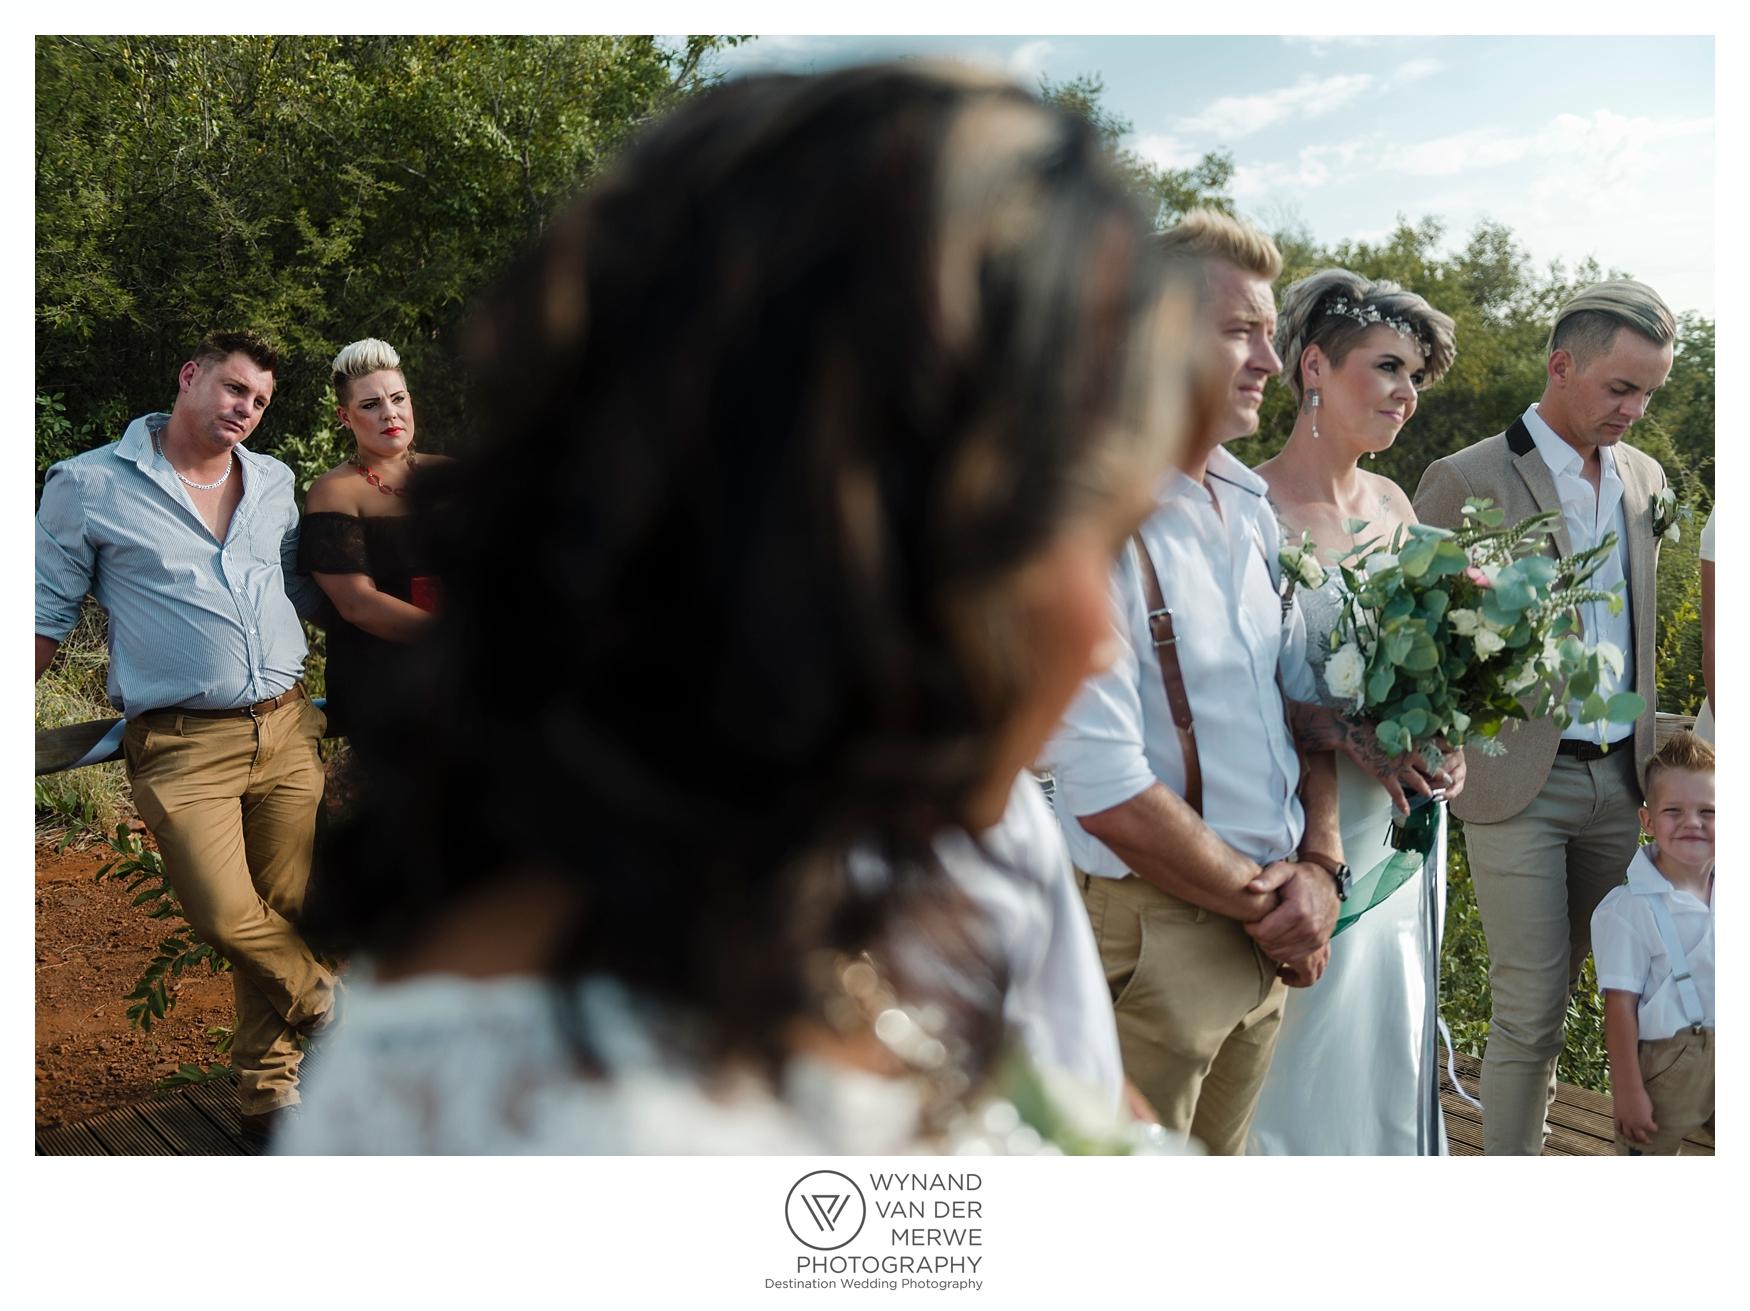 WynandvanderMerwe_weddingphotography_bushveldwedding_northam_bushveld_limpopowedding_limpopo_southafrica-92.jpg